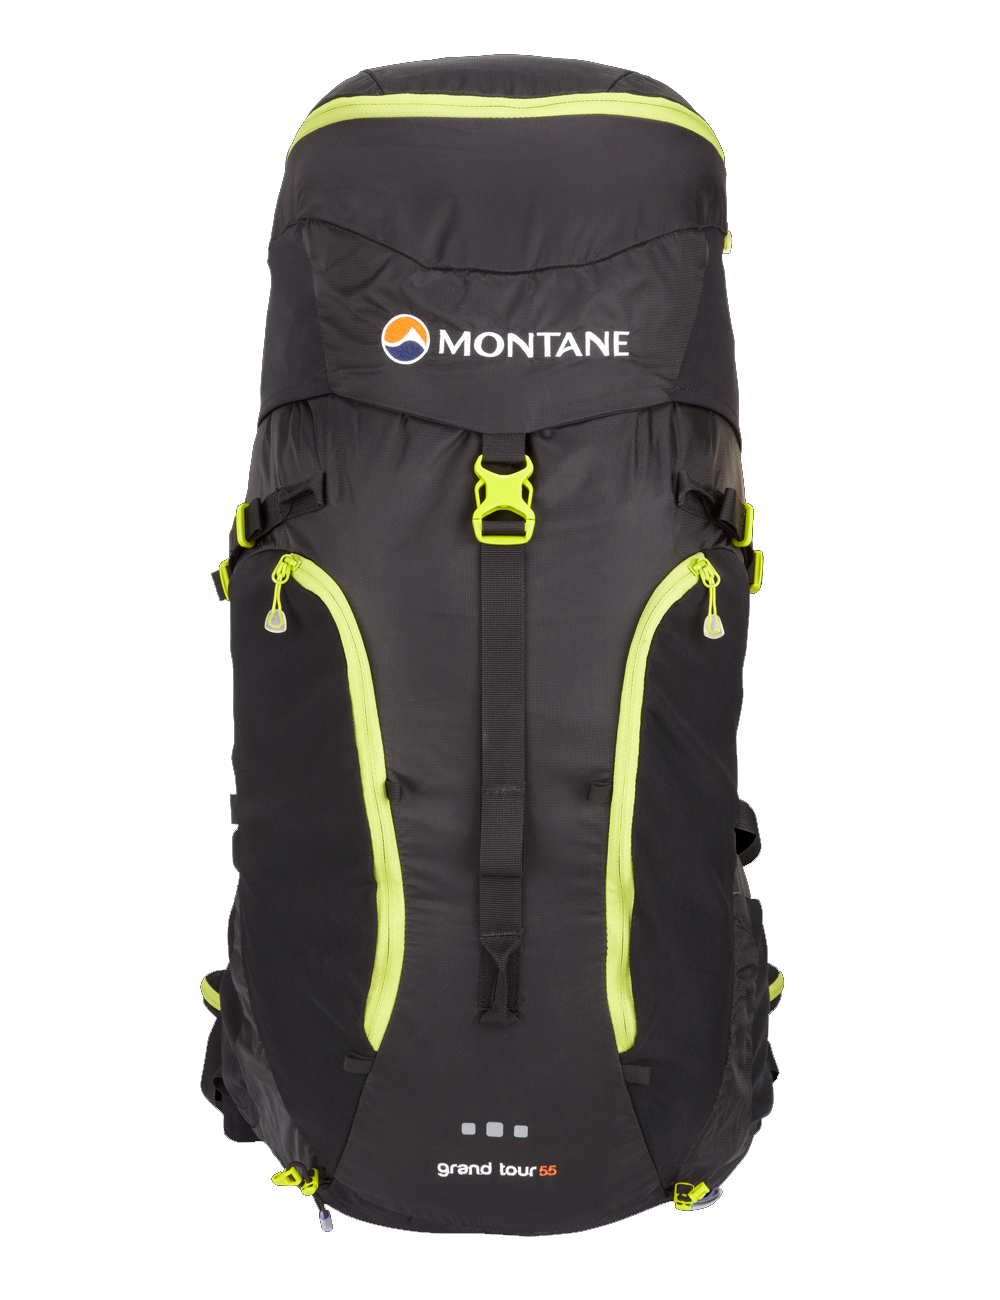 Montane Grand Tour 55